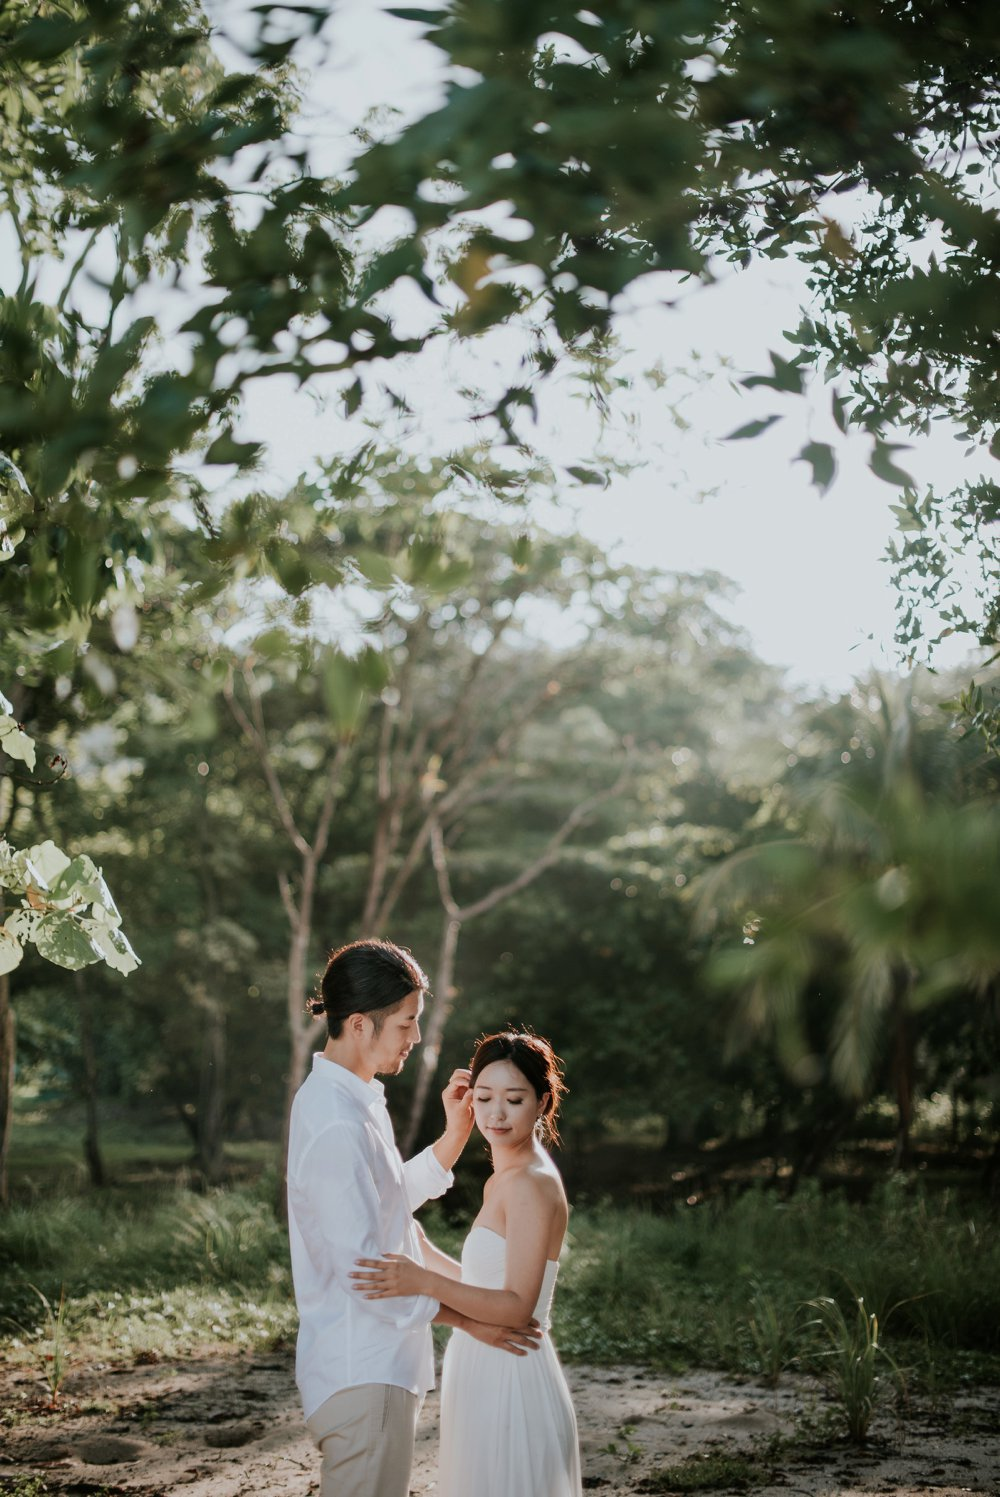 Hiro_Yui_wedding_photograhy_costa_rica_santa_teresa_0036.jpg